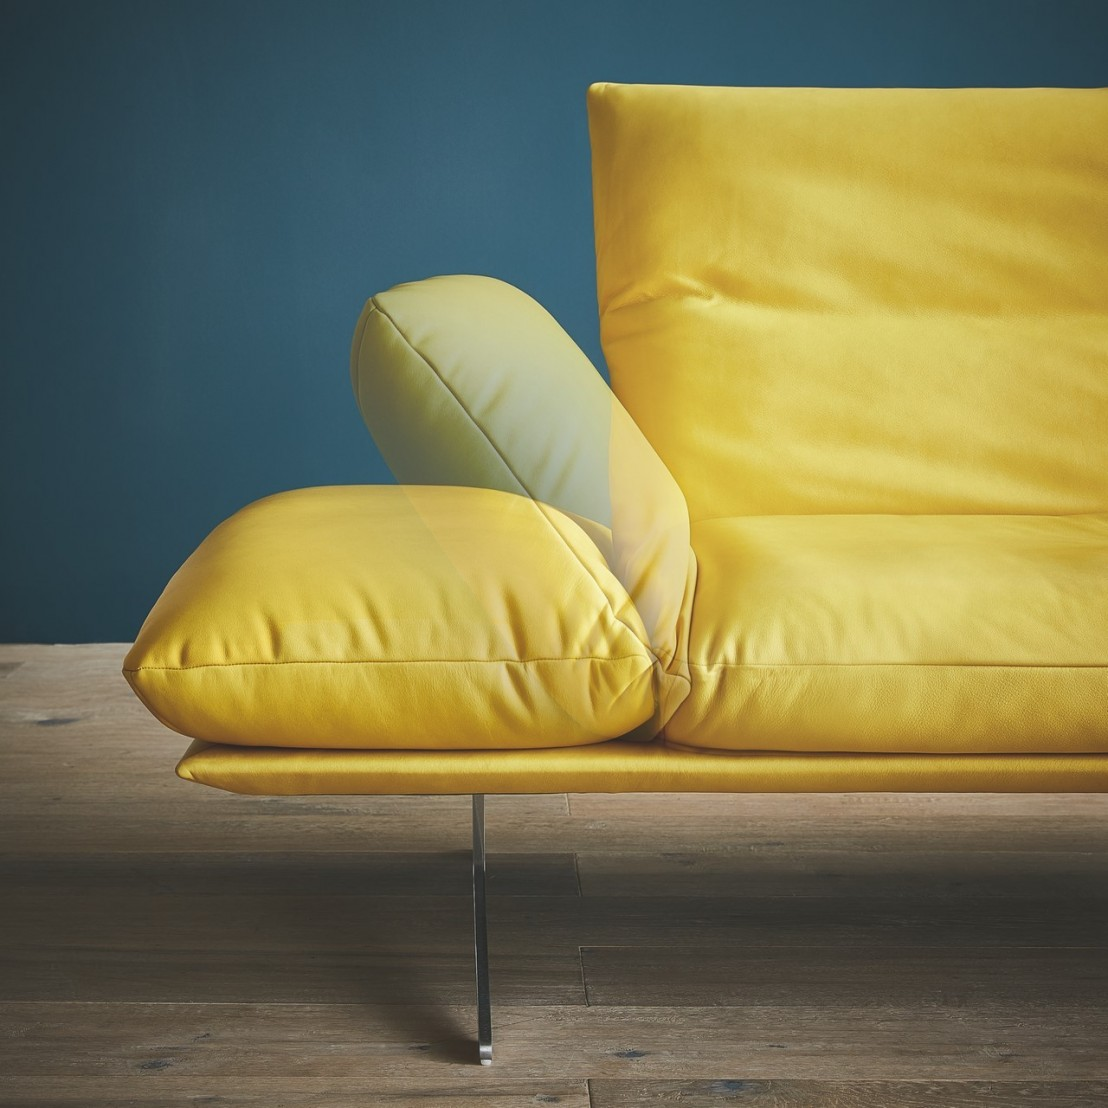 ultra design ultra confortable nouveau canap ad senso. Black Bedroom Furniture Sets. Home Design Ideas